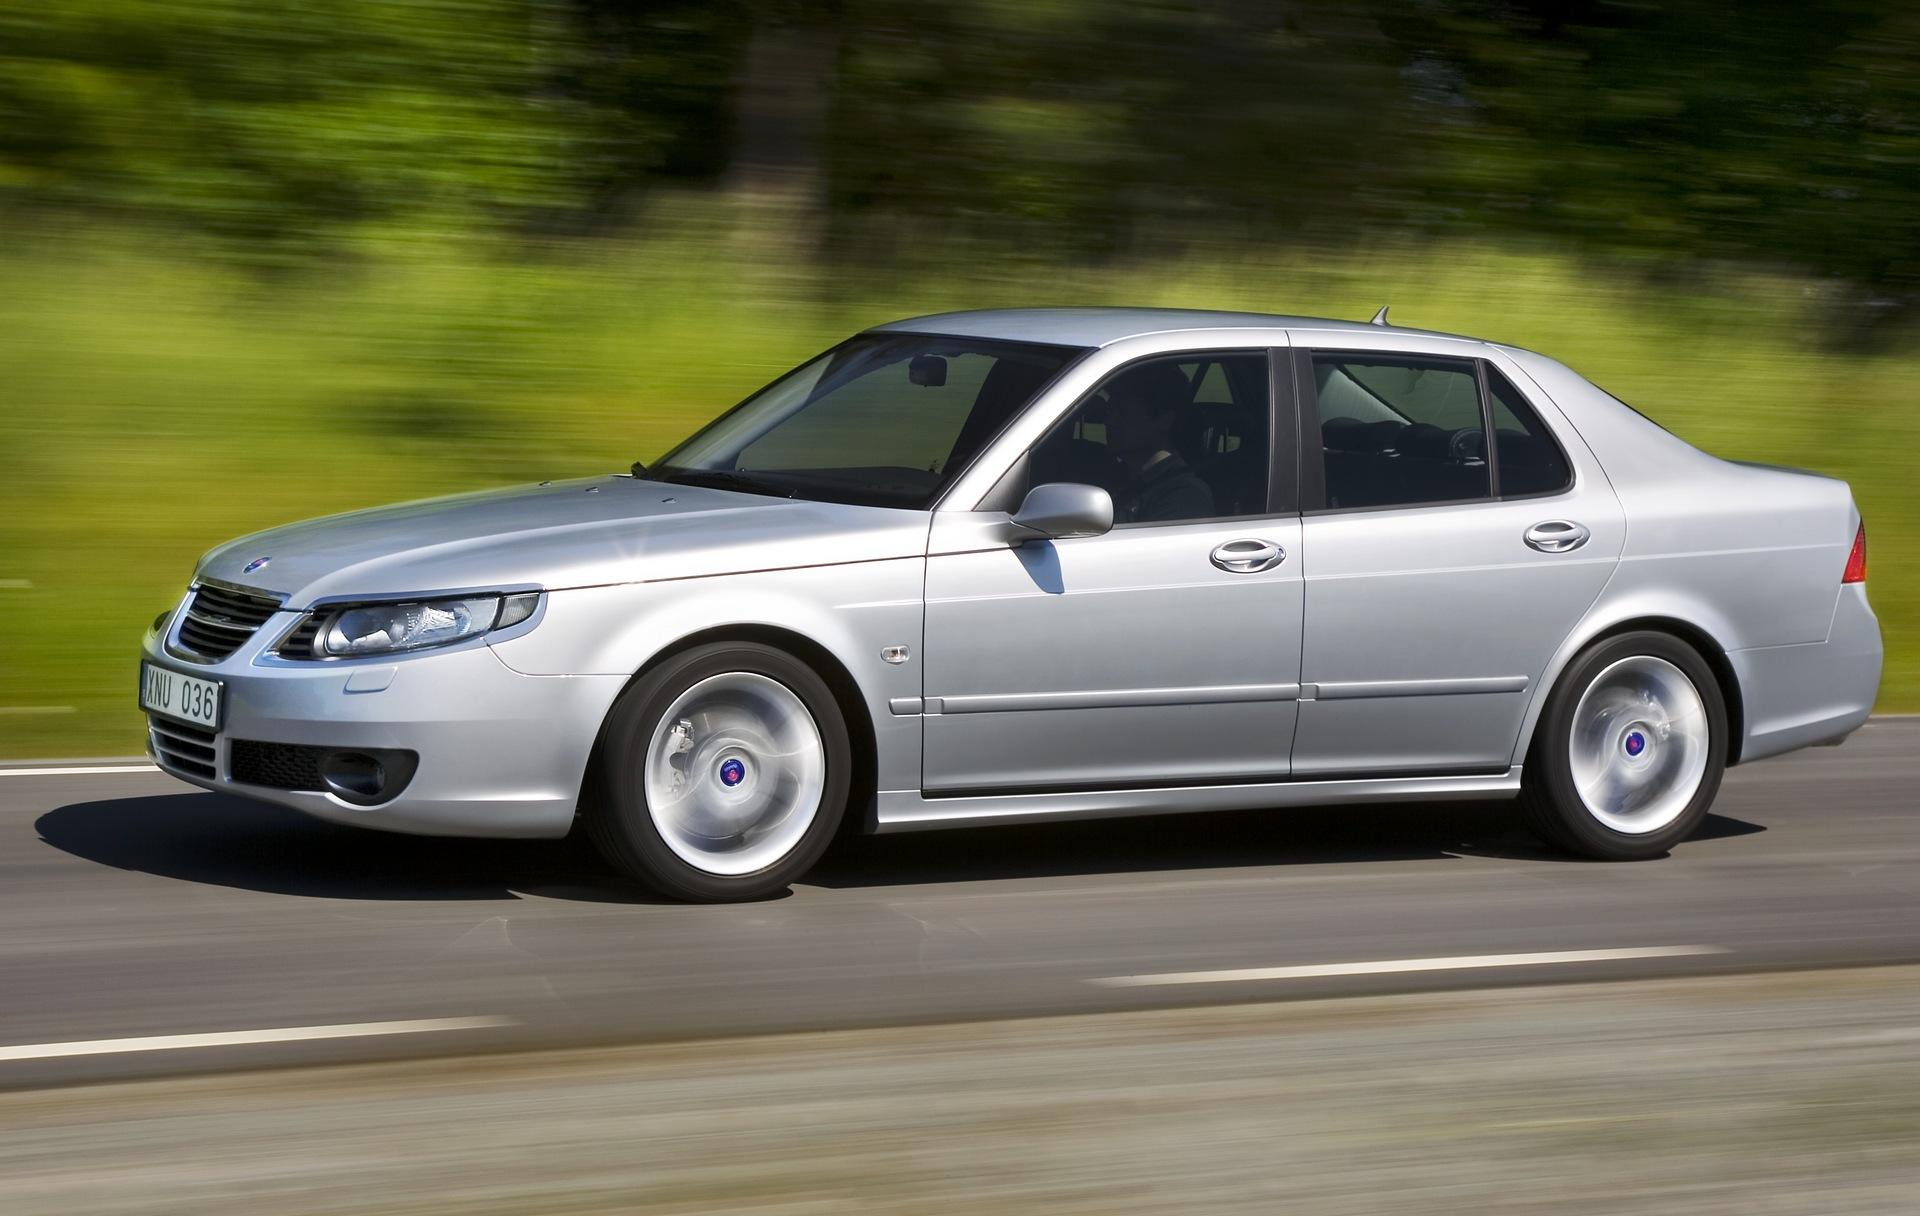 2008 Saab 9 5 News And Information Conceptcarz Com